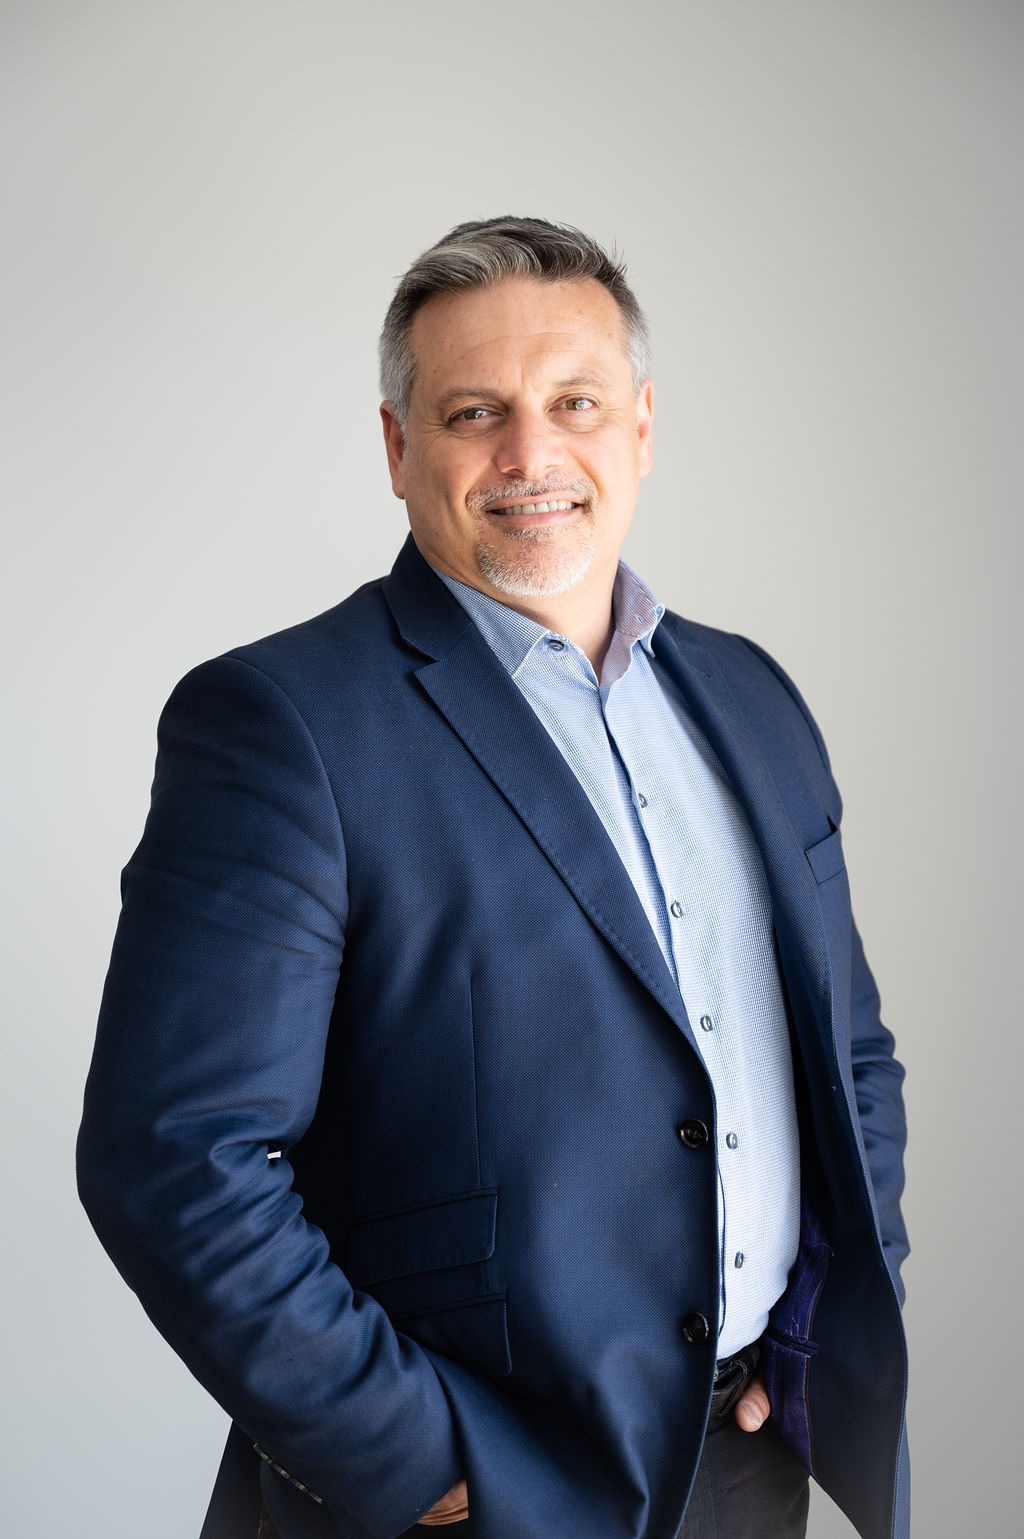 Director & Co-Founder Robert Marusco - Here Business & Wealth